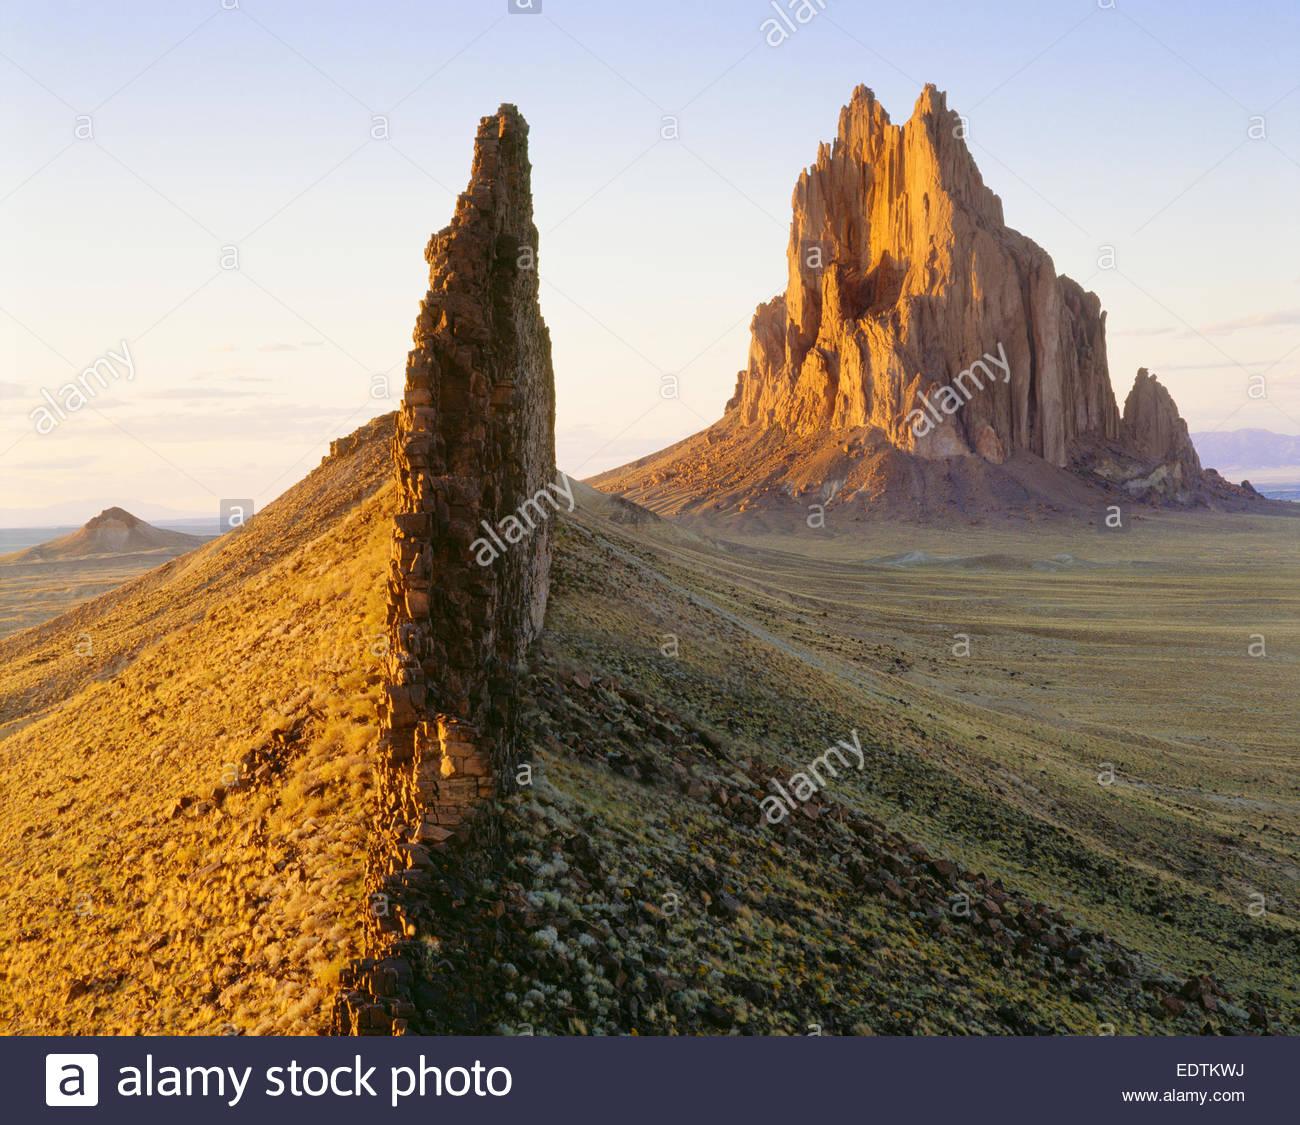 Shiprock, vulkanischer Monolith 1100 Fuß hoch, mit angeschlossenen vulkanischen Deich.  Navajo Indian Reservation, Stockbild